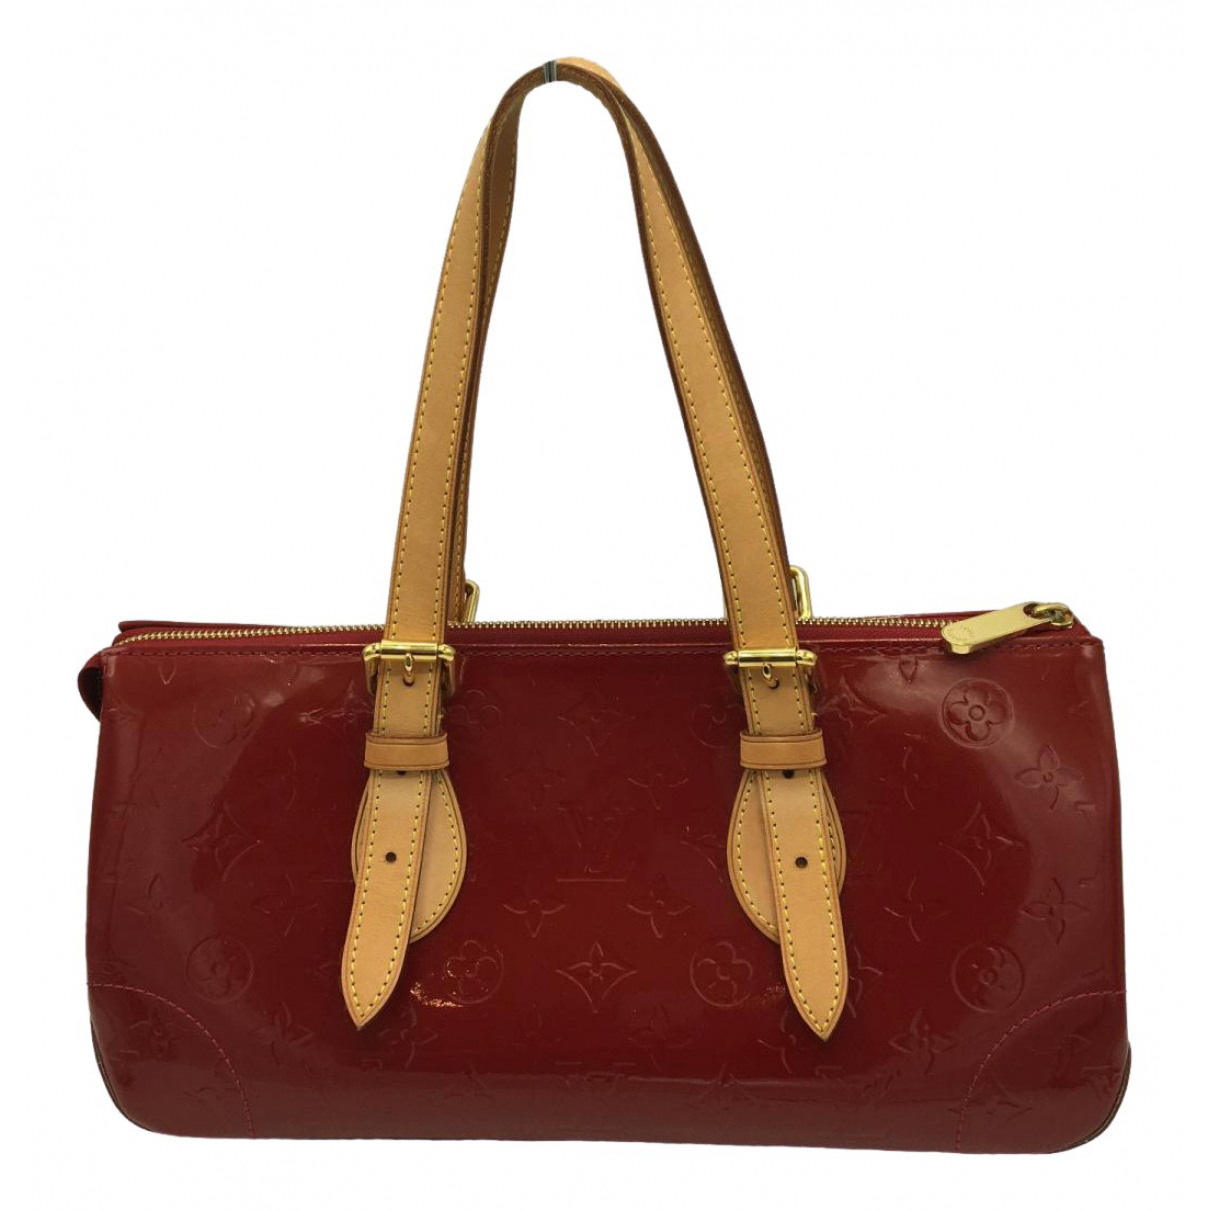 Louis Vuitton Rosewood Burgundy Patent leather handbag for Women \N